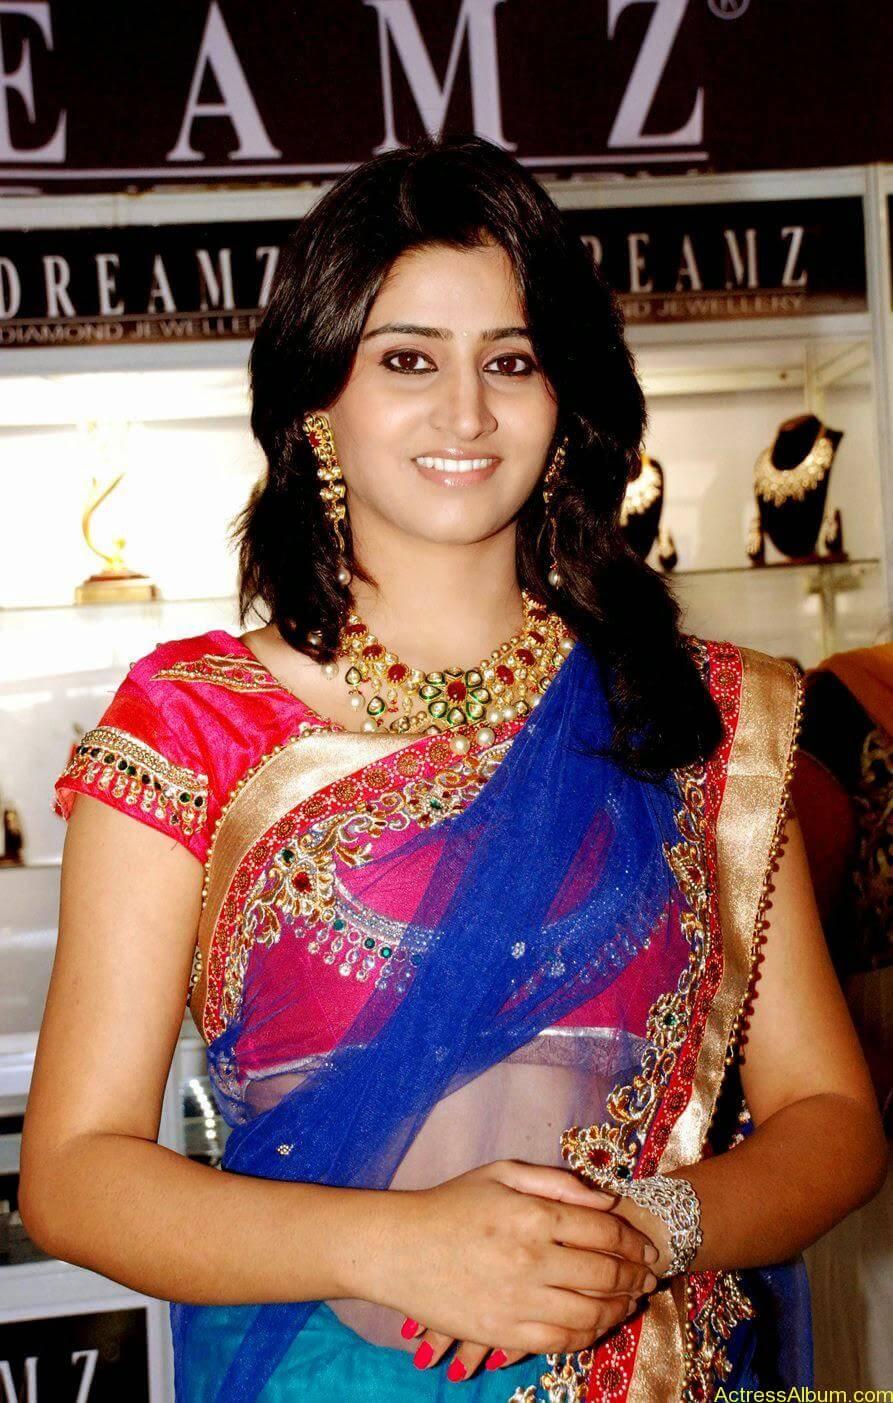 Shamli in saree at jewelry shop opening 1